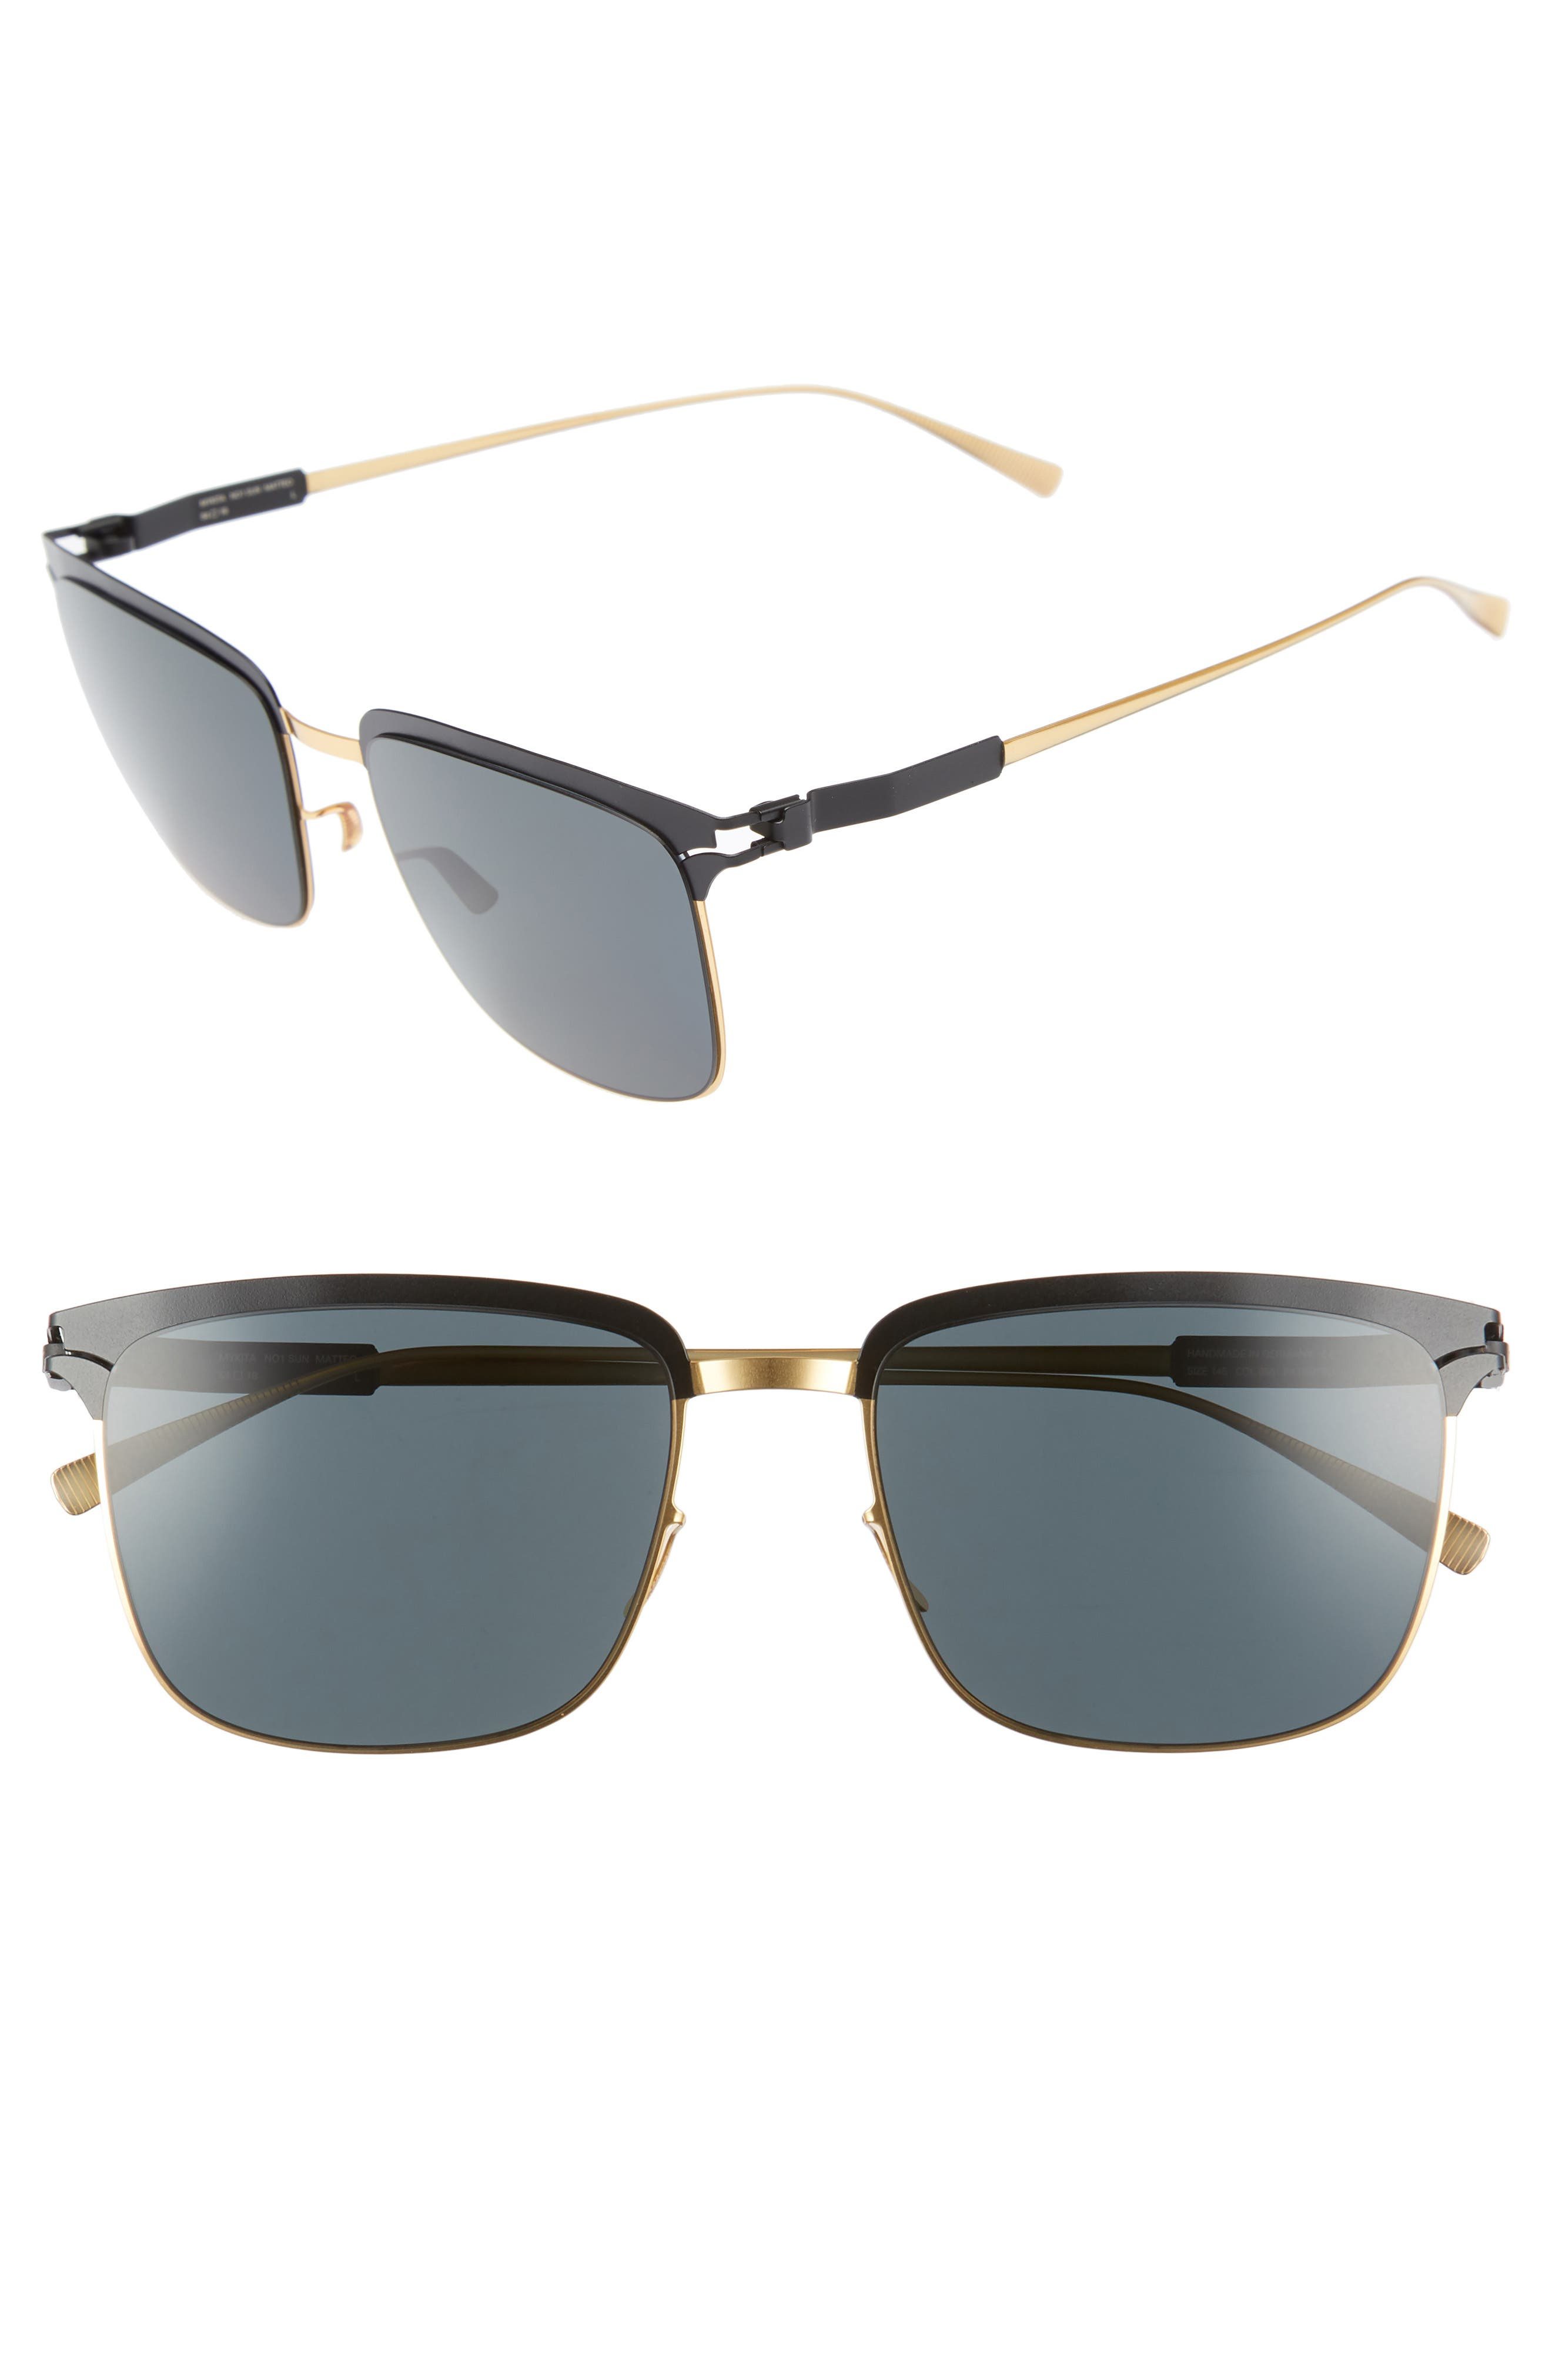 Matteo 54mm Polarized Sunglasses,                         Main,                         color, Gold/ Black